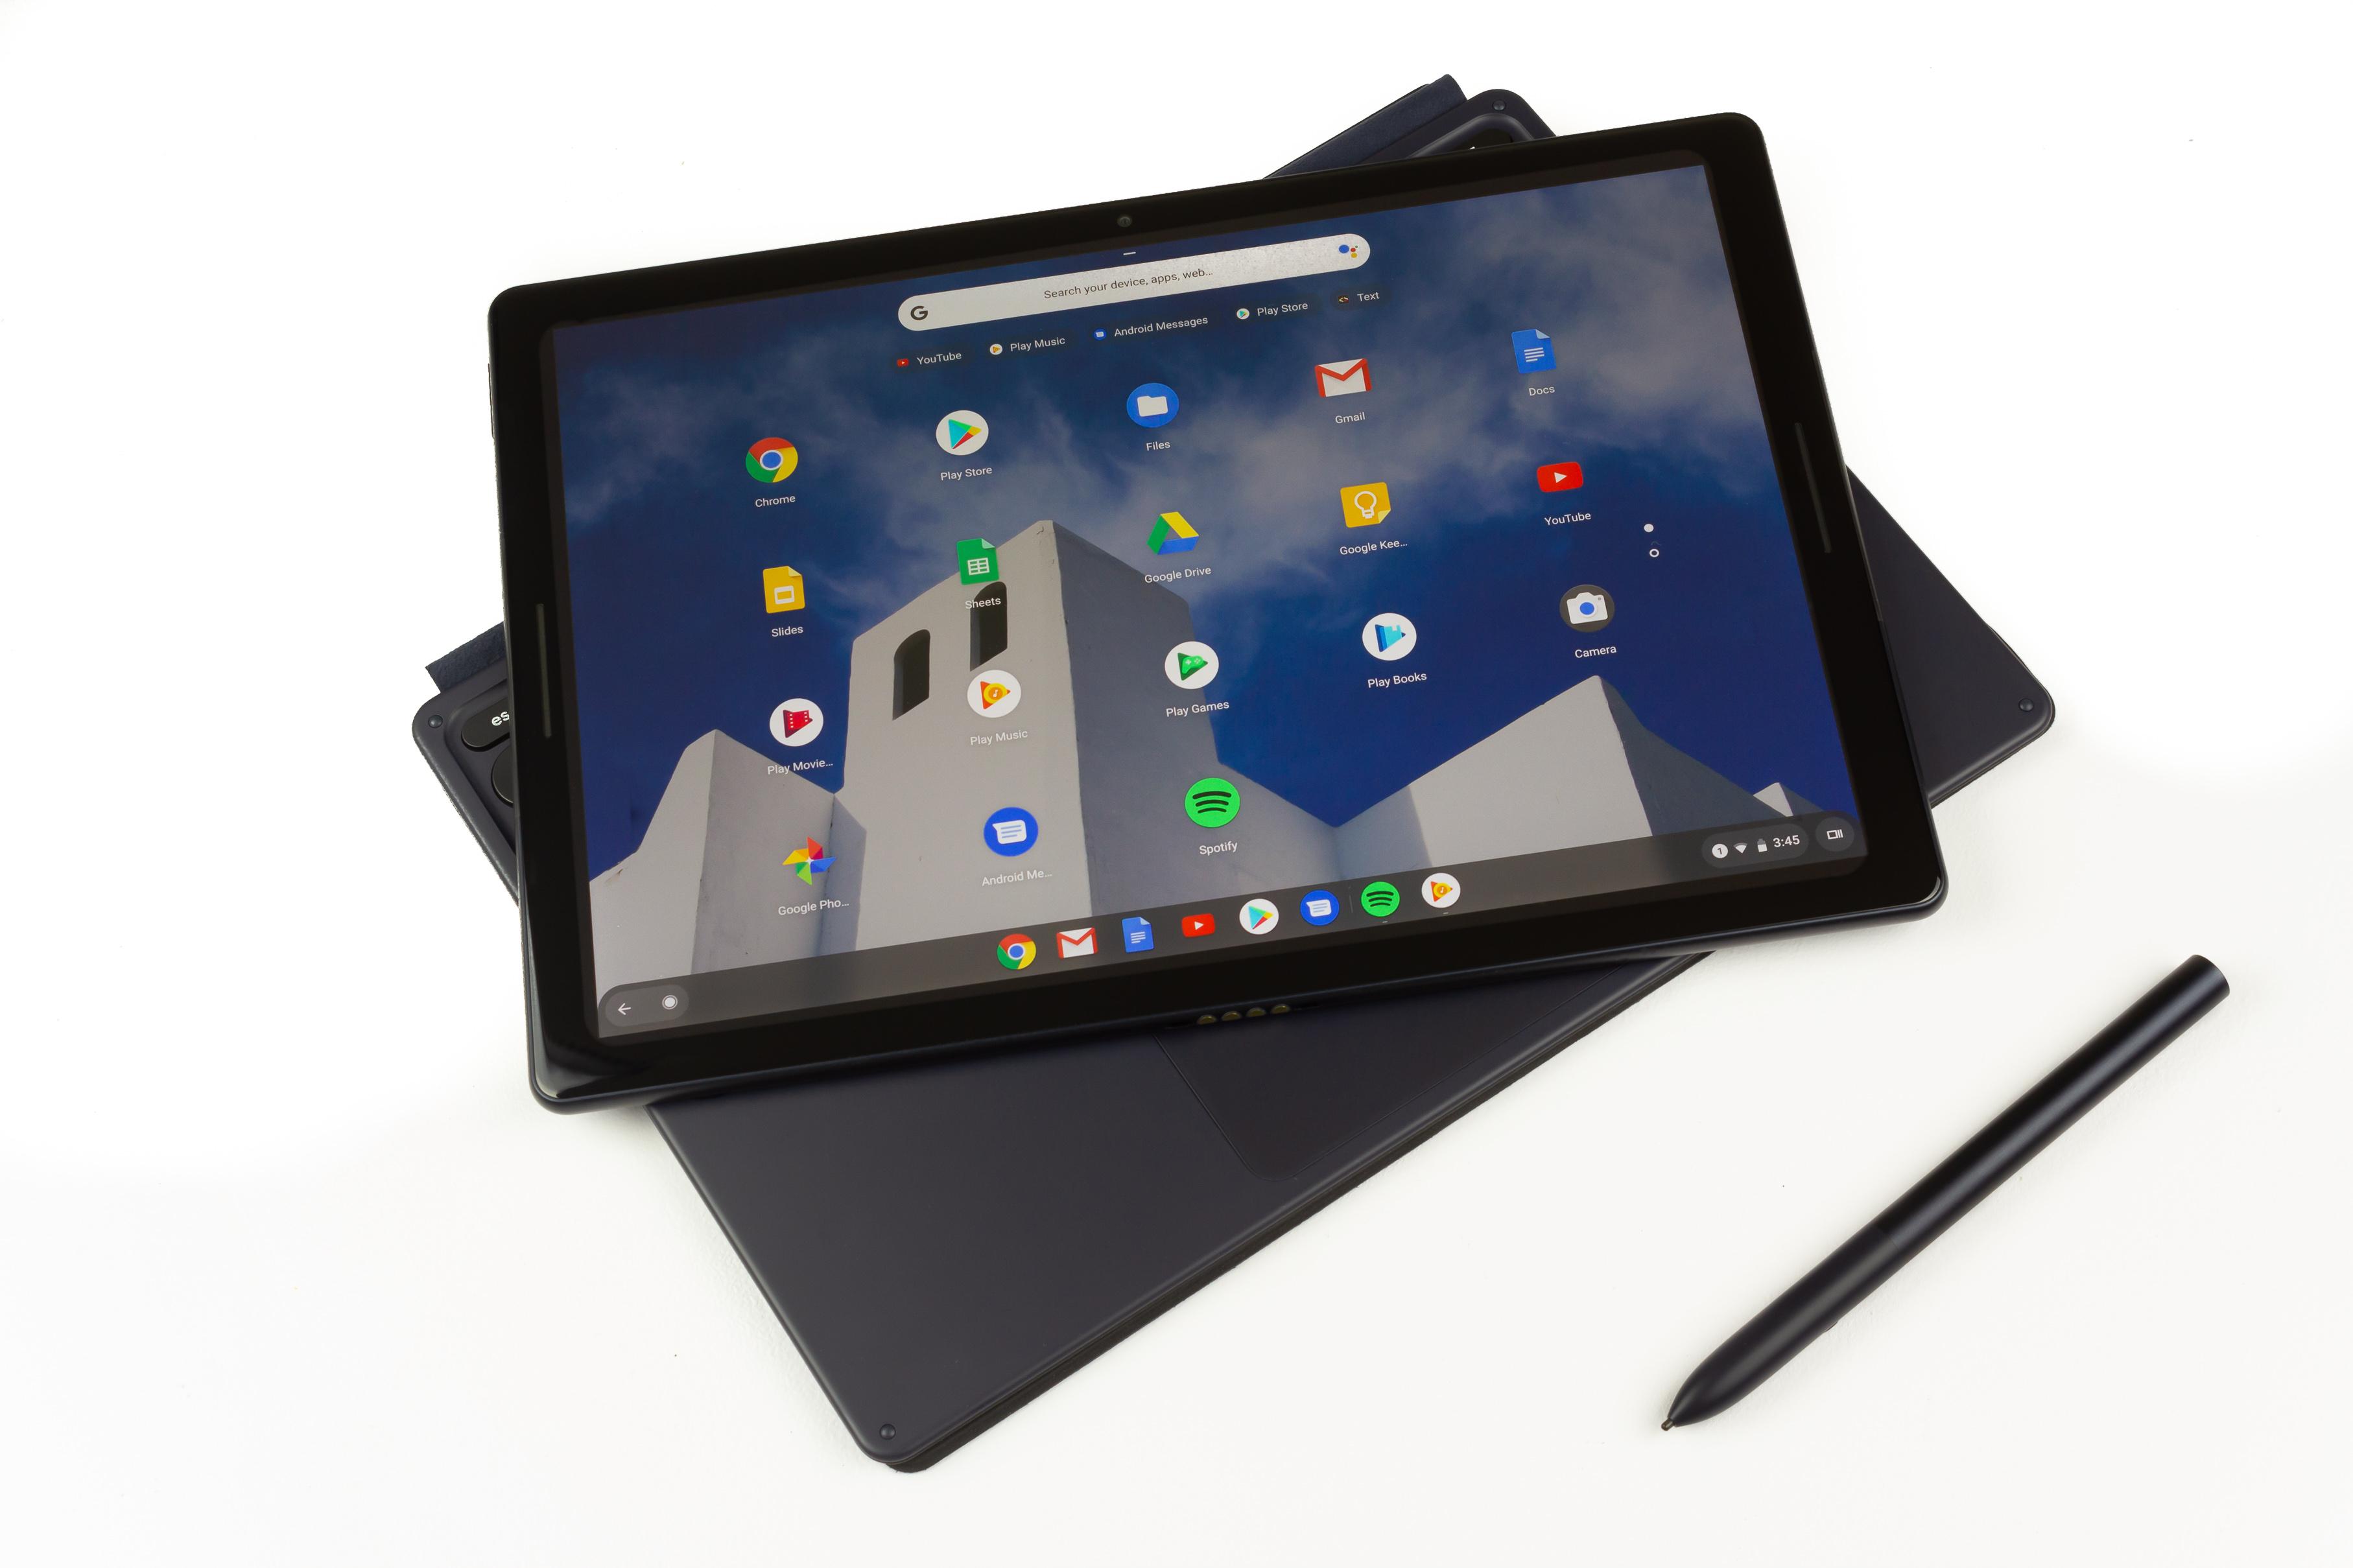 Google Pixel Slate hands-on: the Chromebook goes detachable